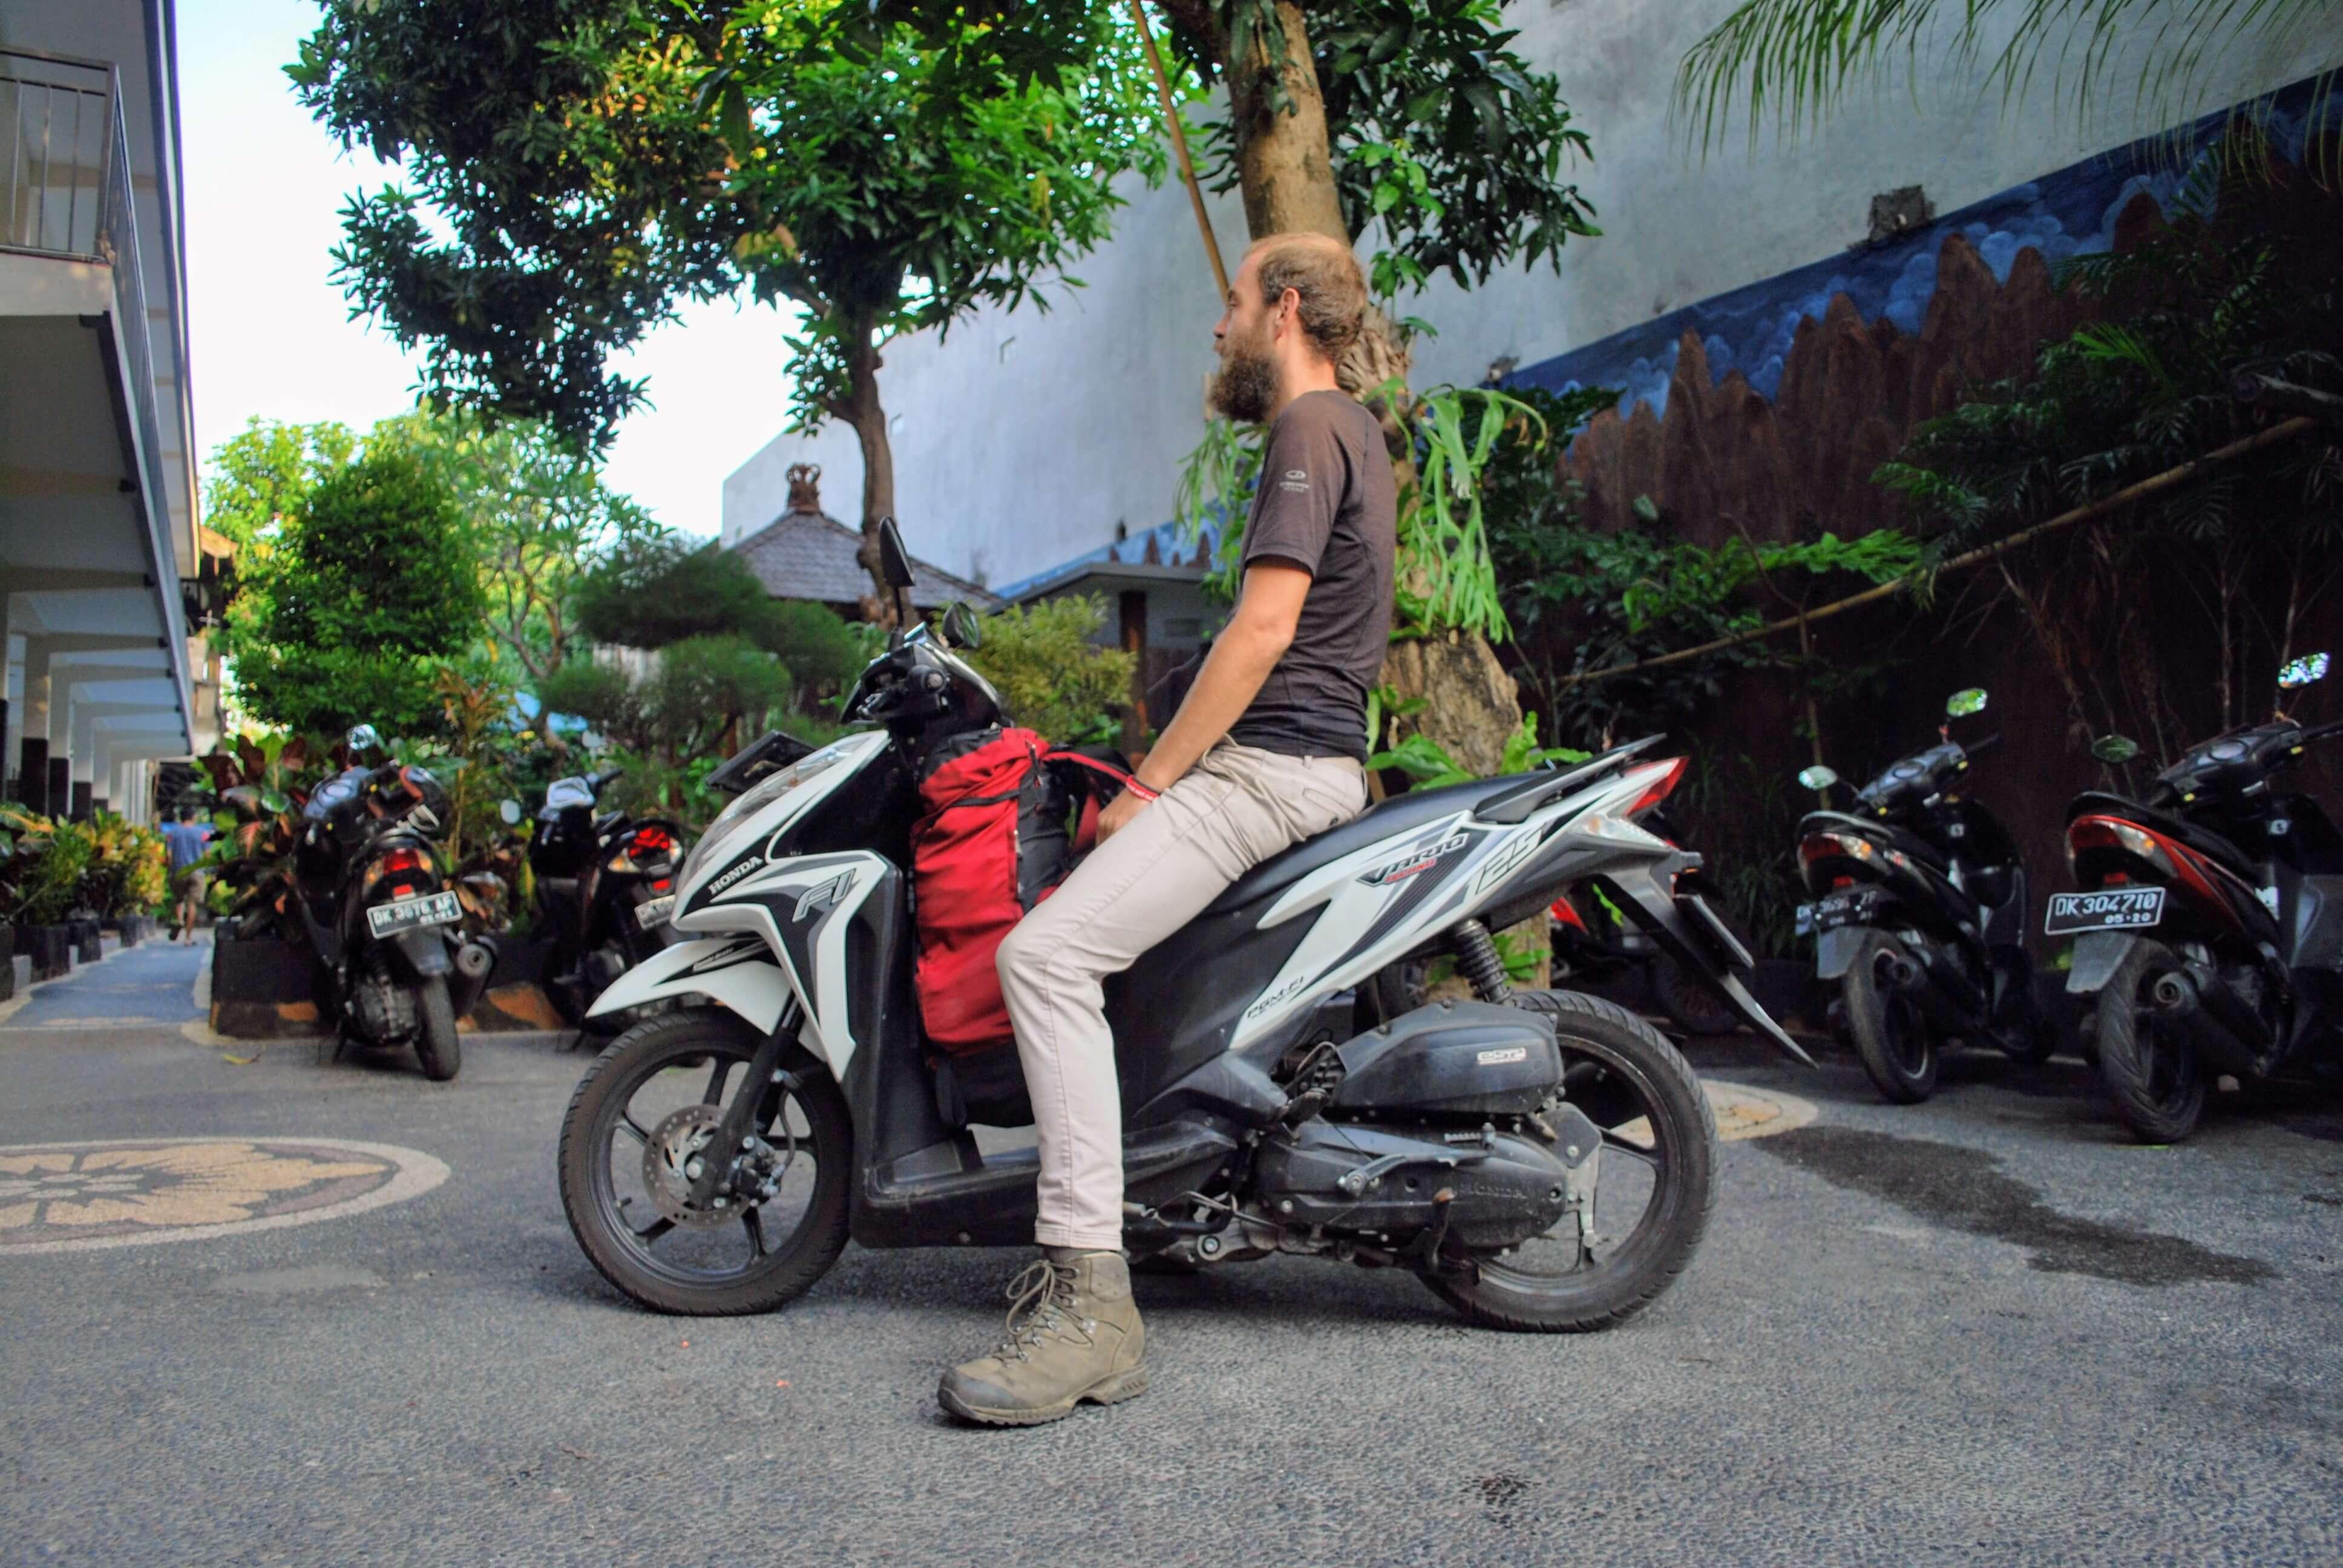 Motorbike Bali - renting a motorbike